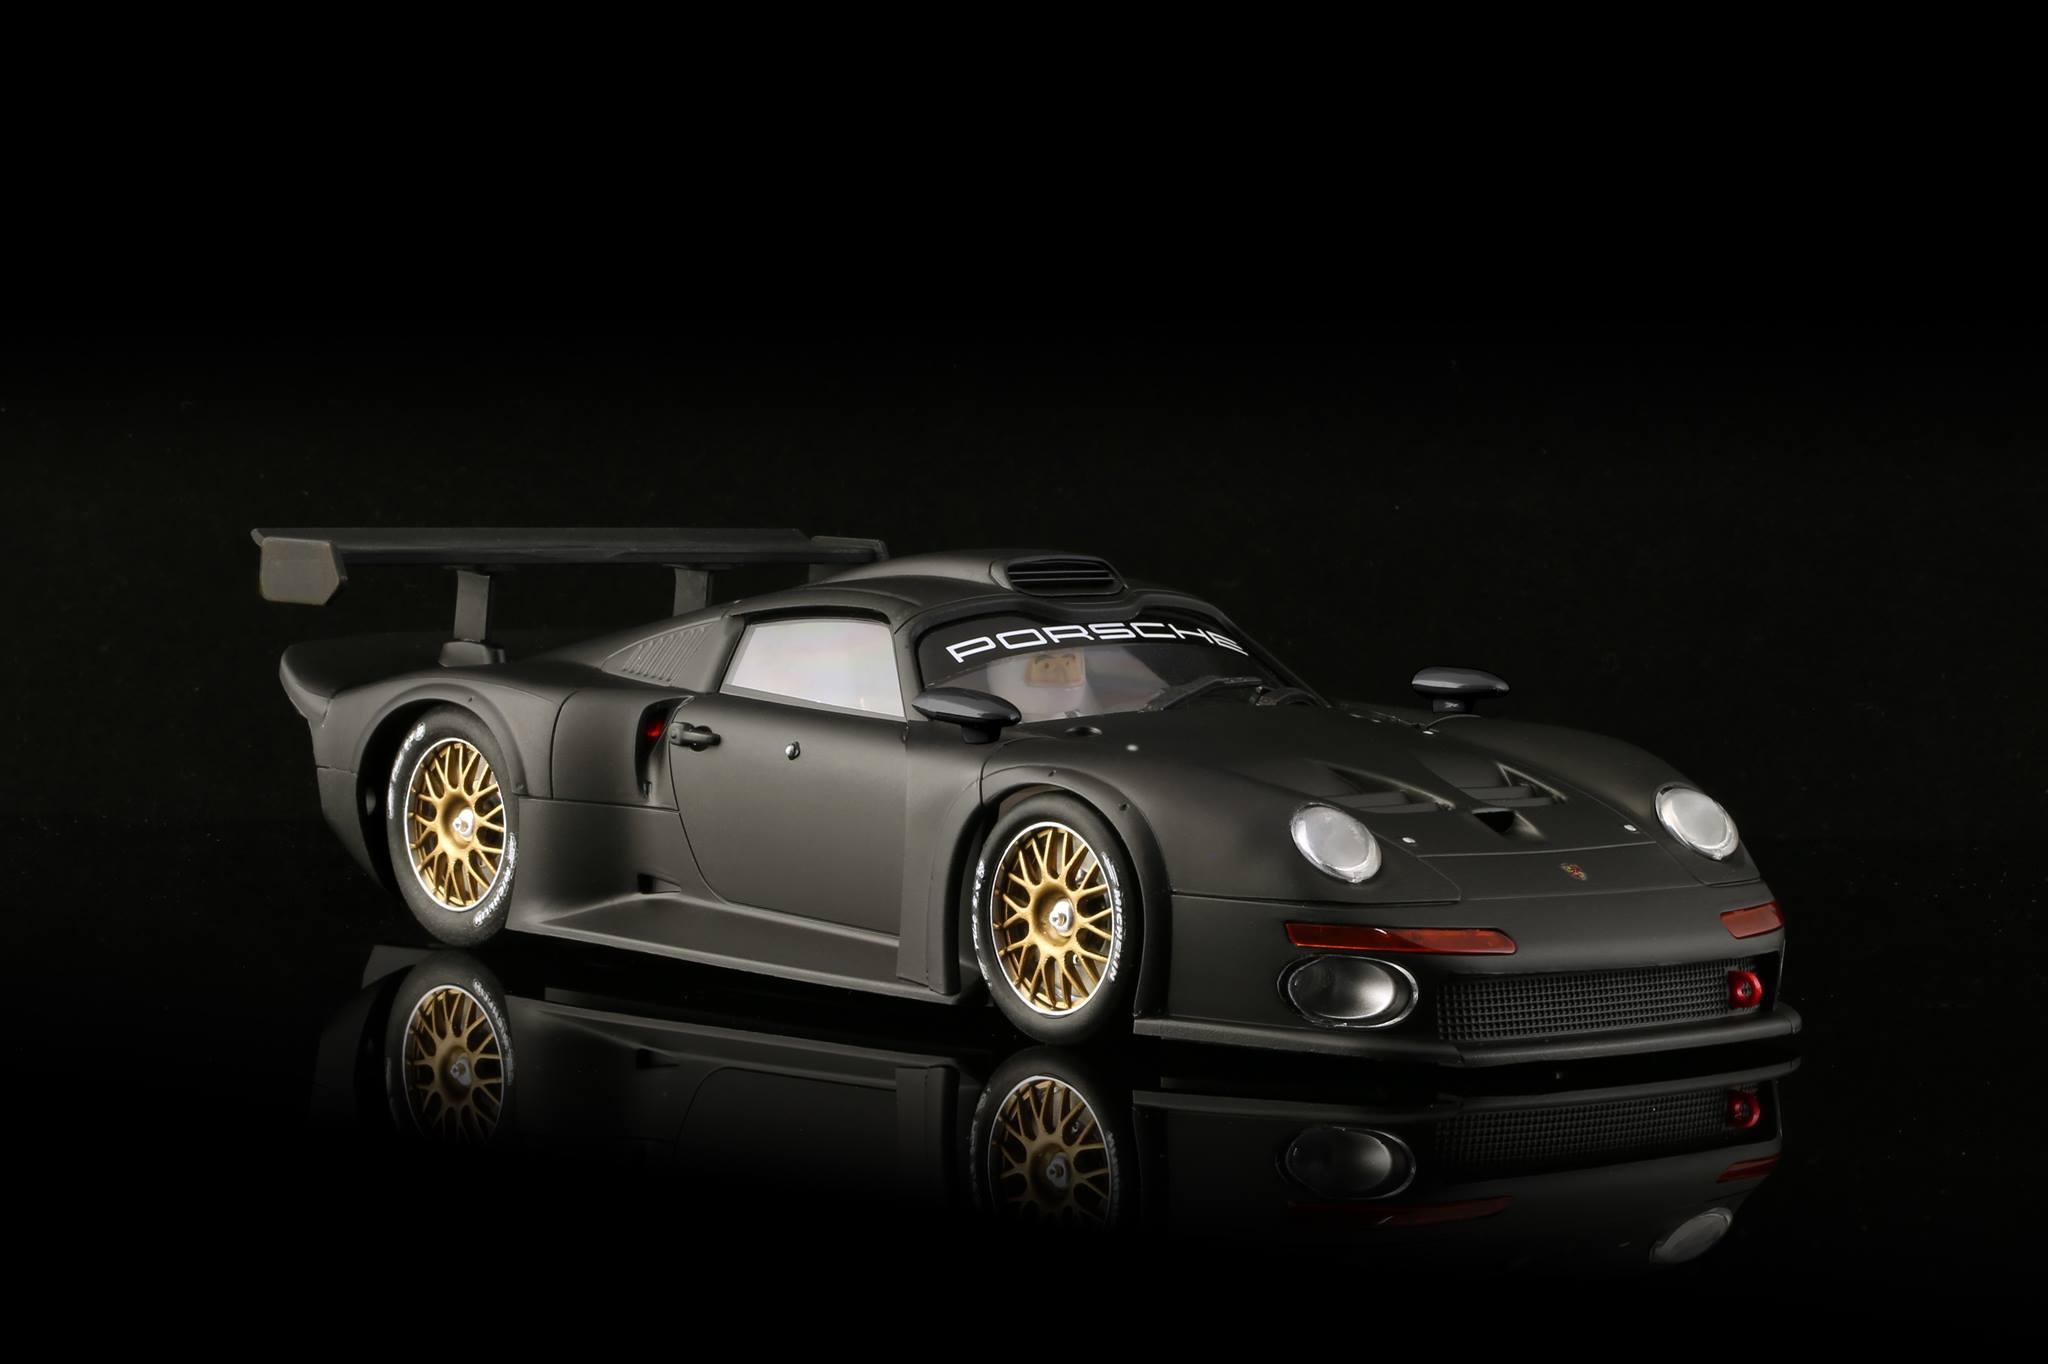 brm048 1 24 scale porsche 911 gt1 black limited edition. Black Bedroom Furniture Sets. Home Design Ideas